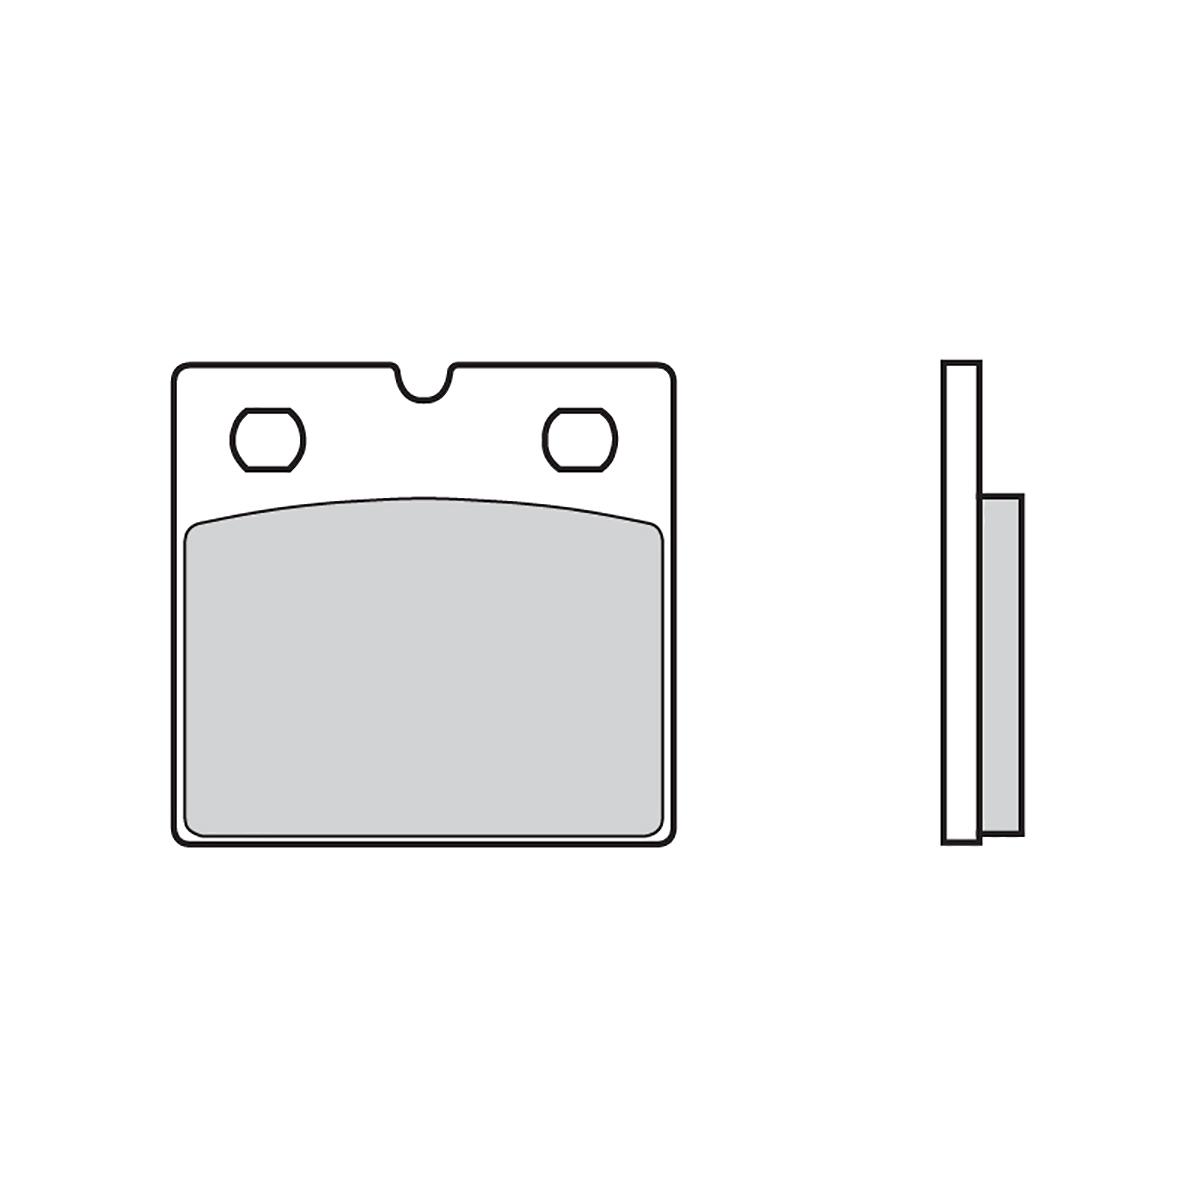 Vorderen Brembo 07 Bremsbelage fur Bmw K 75 ABS (SPECIAL BREMSSATTEL) 1991 1993